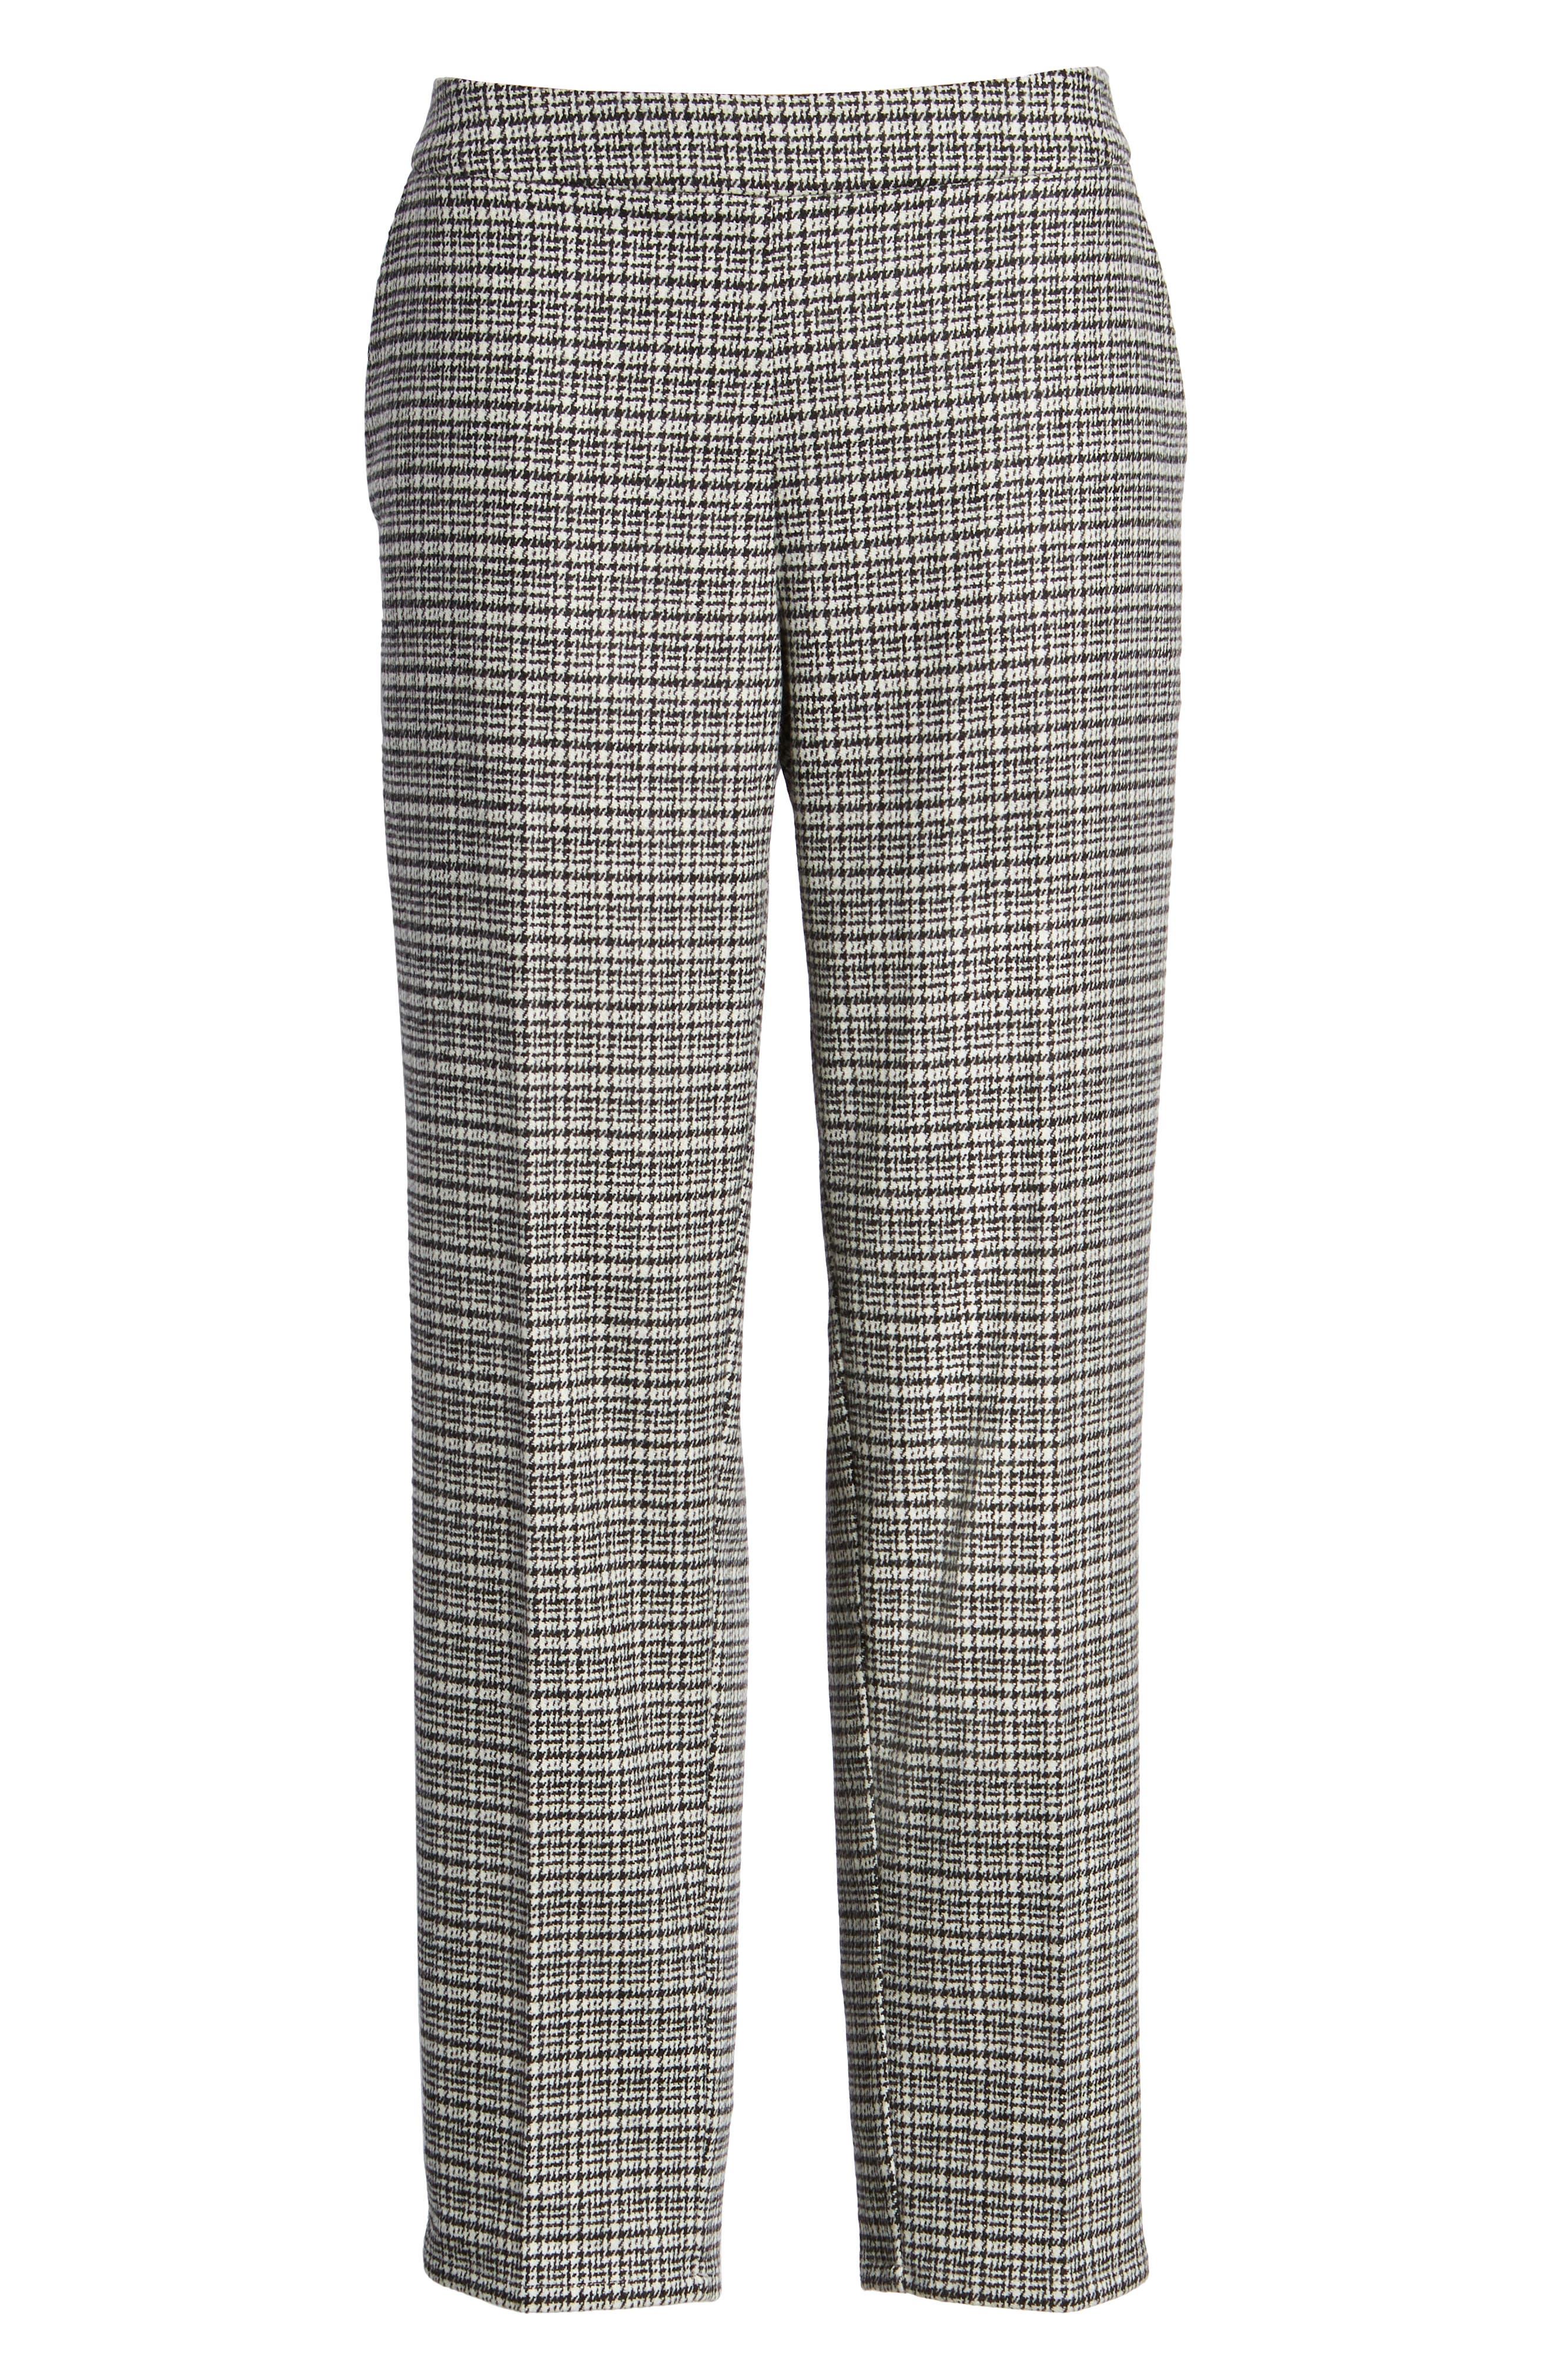 Slim Ankle Pants,                             Alternate thumbnail 6, color,                             Black/ White